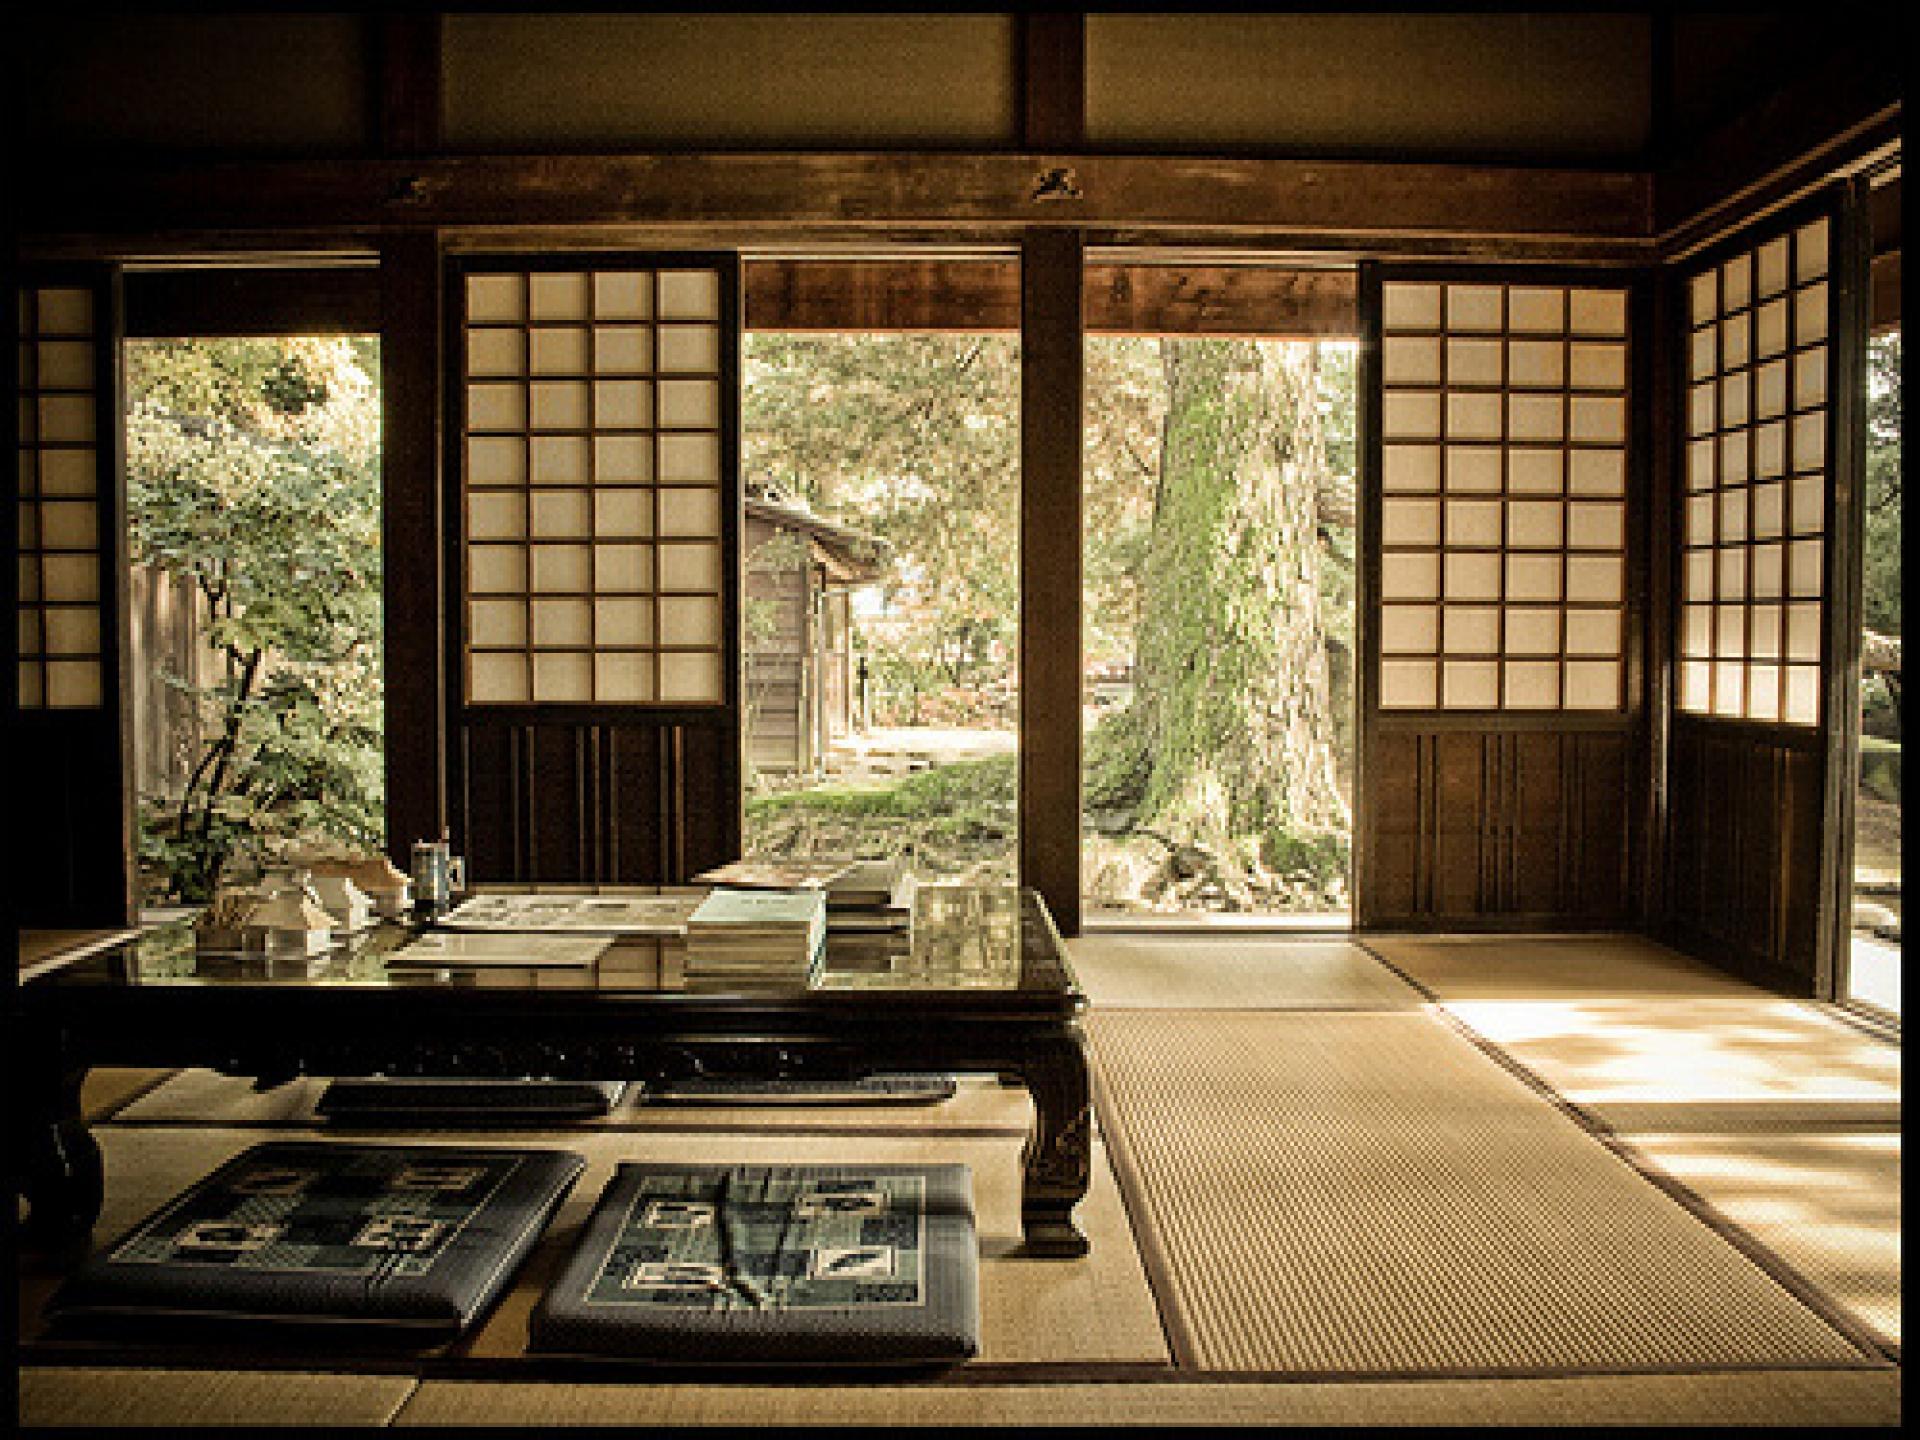 japanese small house interior design photo - 3